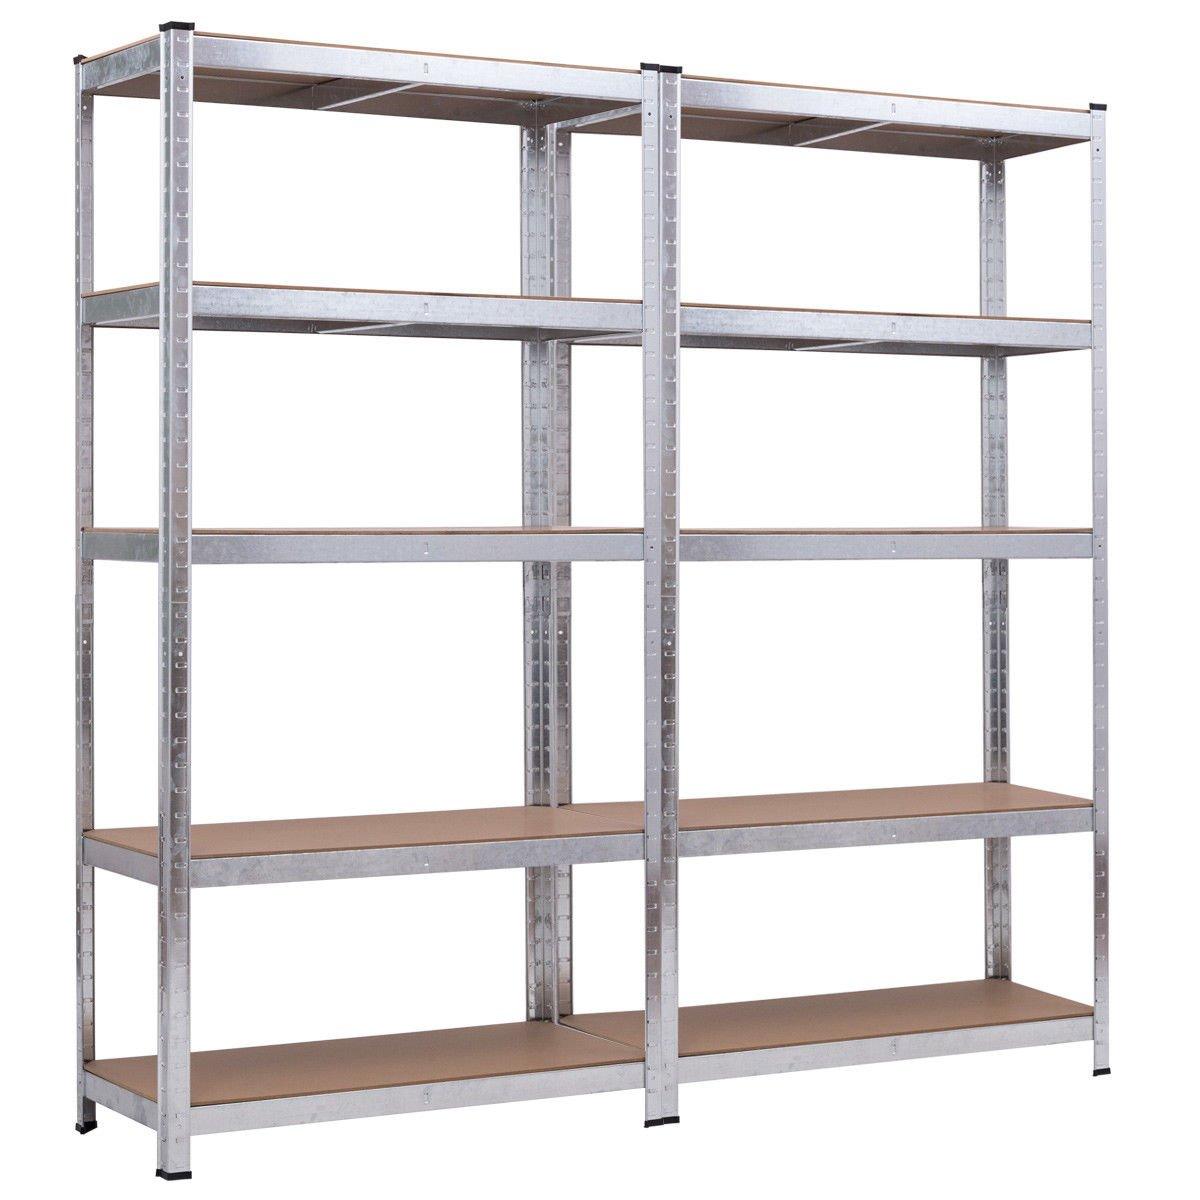 Giantex 2 Pcs 5-Shelf Storage Rack Steel Garage Shelving Unit 5 Adjustable Shelves Heavy Duty Rack Multipurpose Display Stand Utility Rack for Books, Clothes, Kitchenware, Tools Bolt-Free Assembly